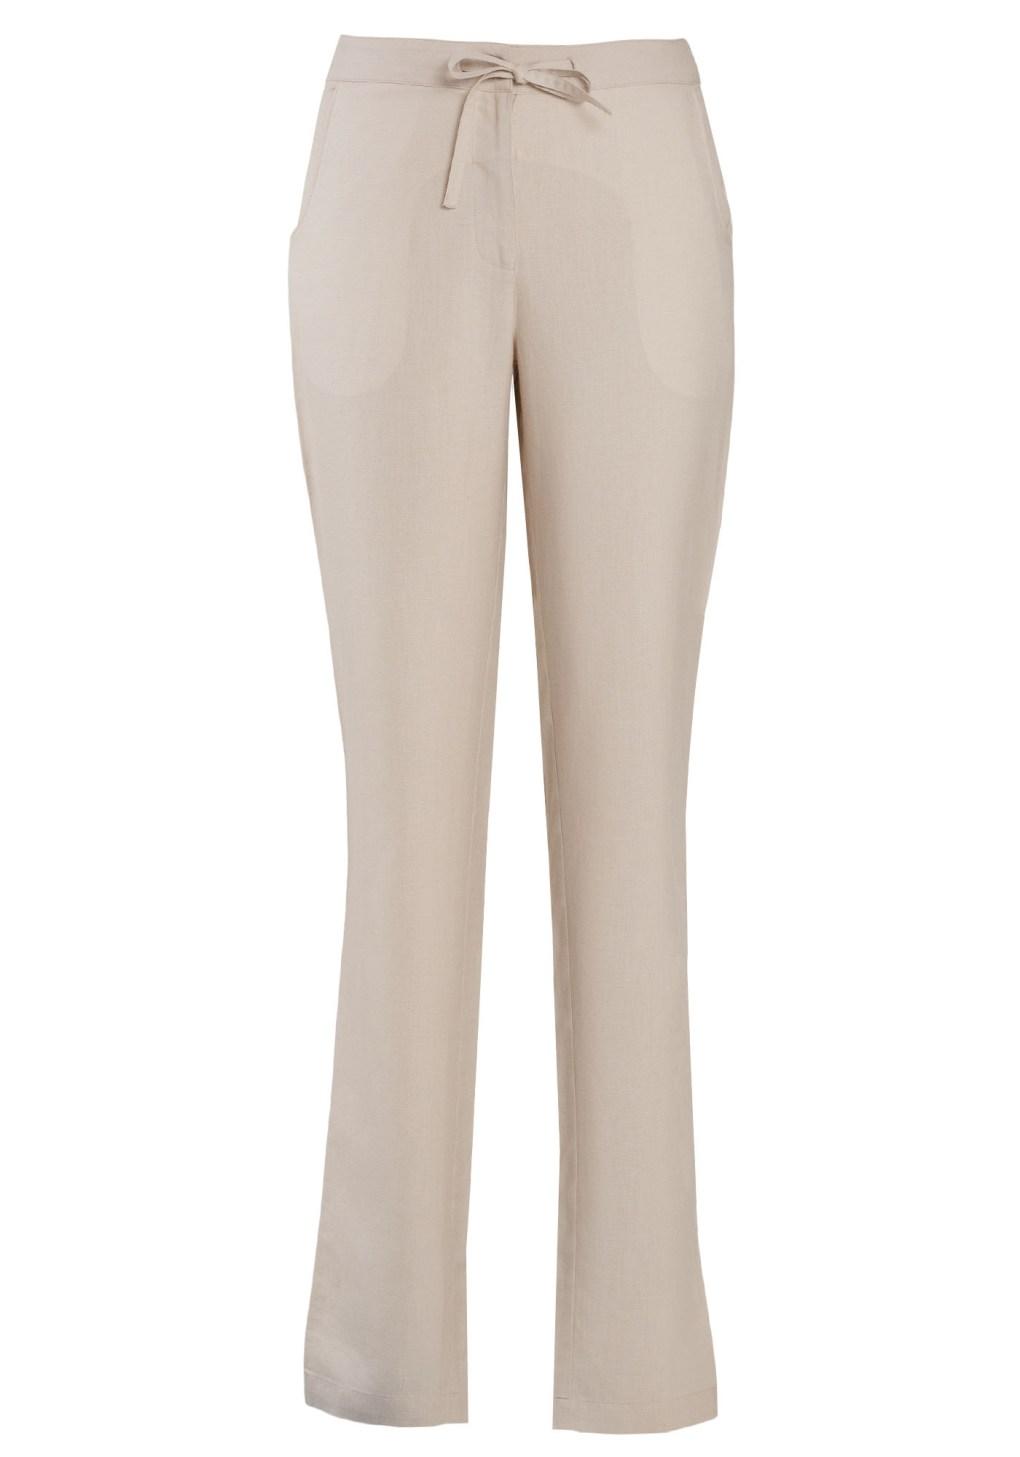 MINC ecofashion Narrow Trousers in Off White Linen with Drawstring